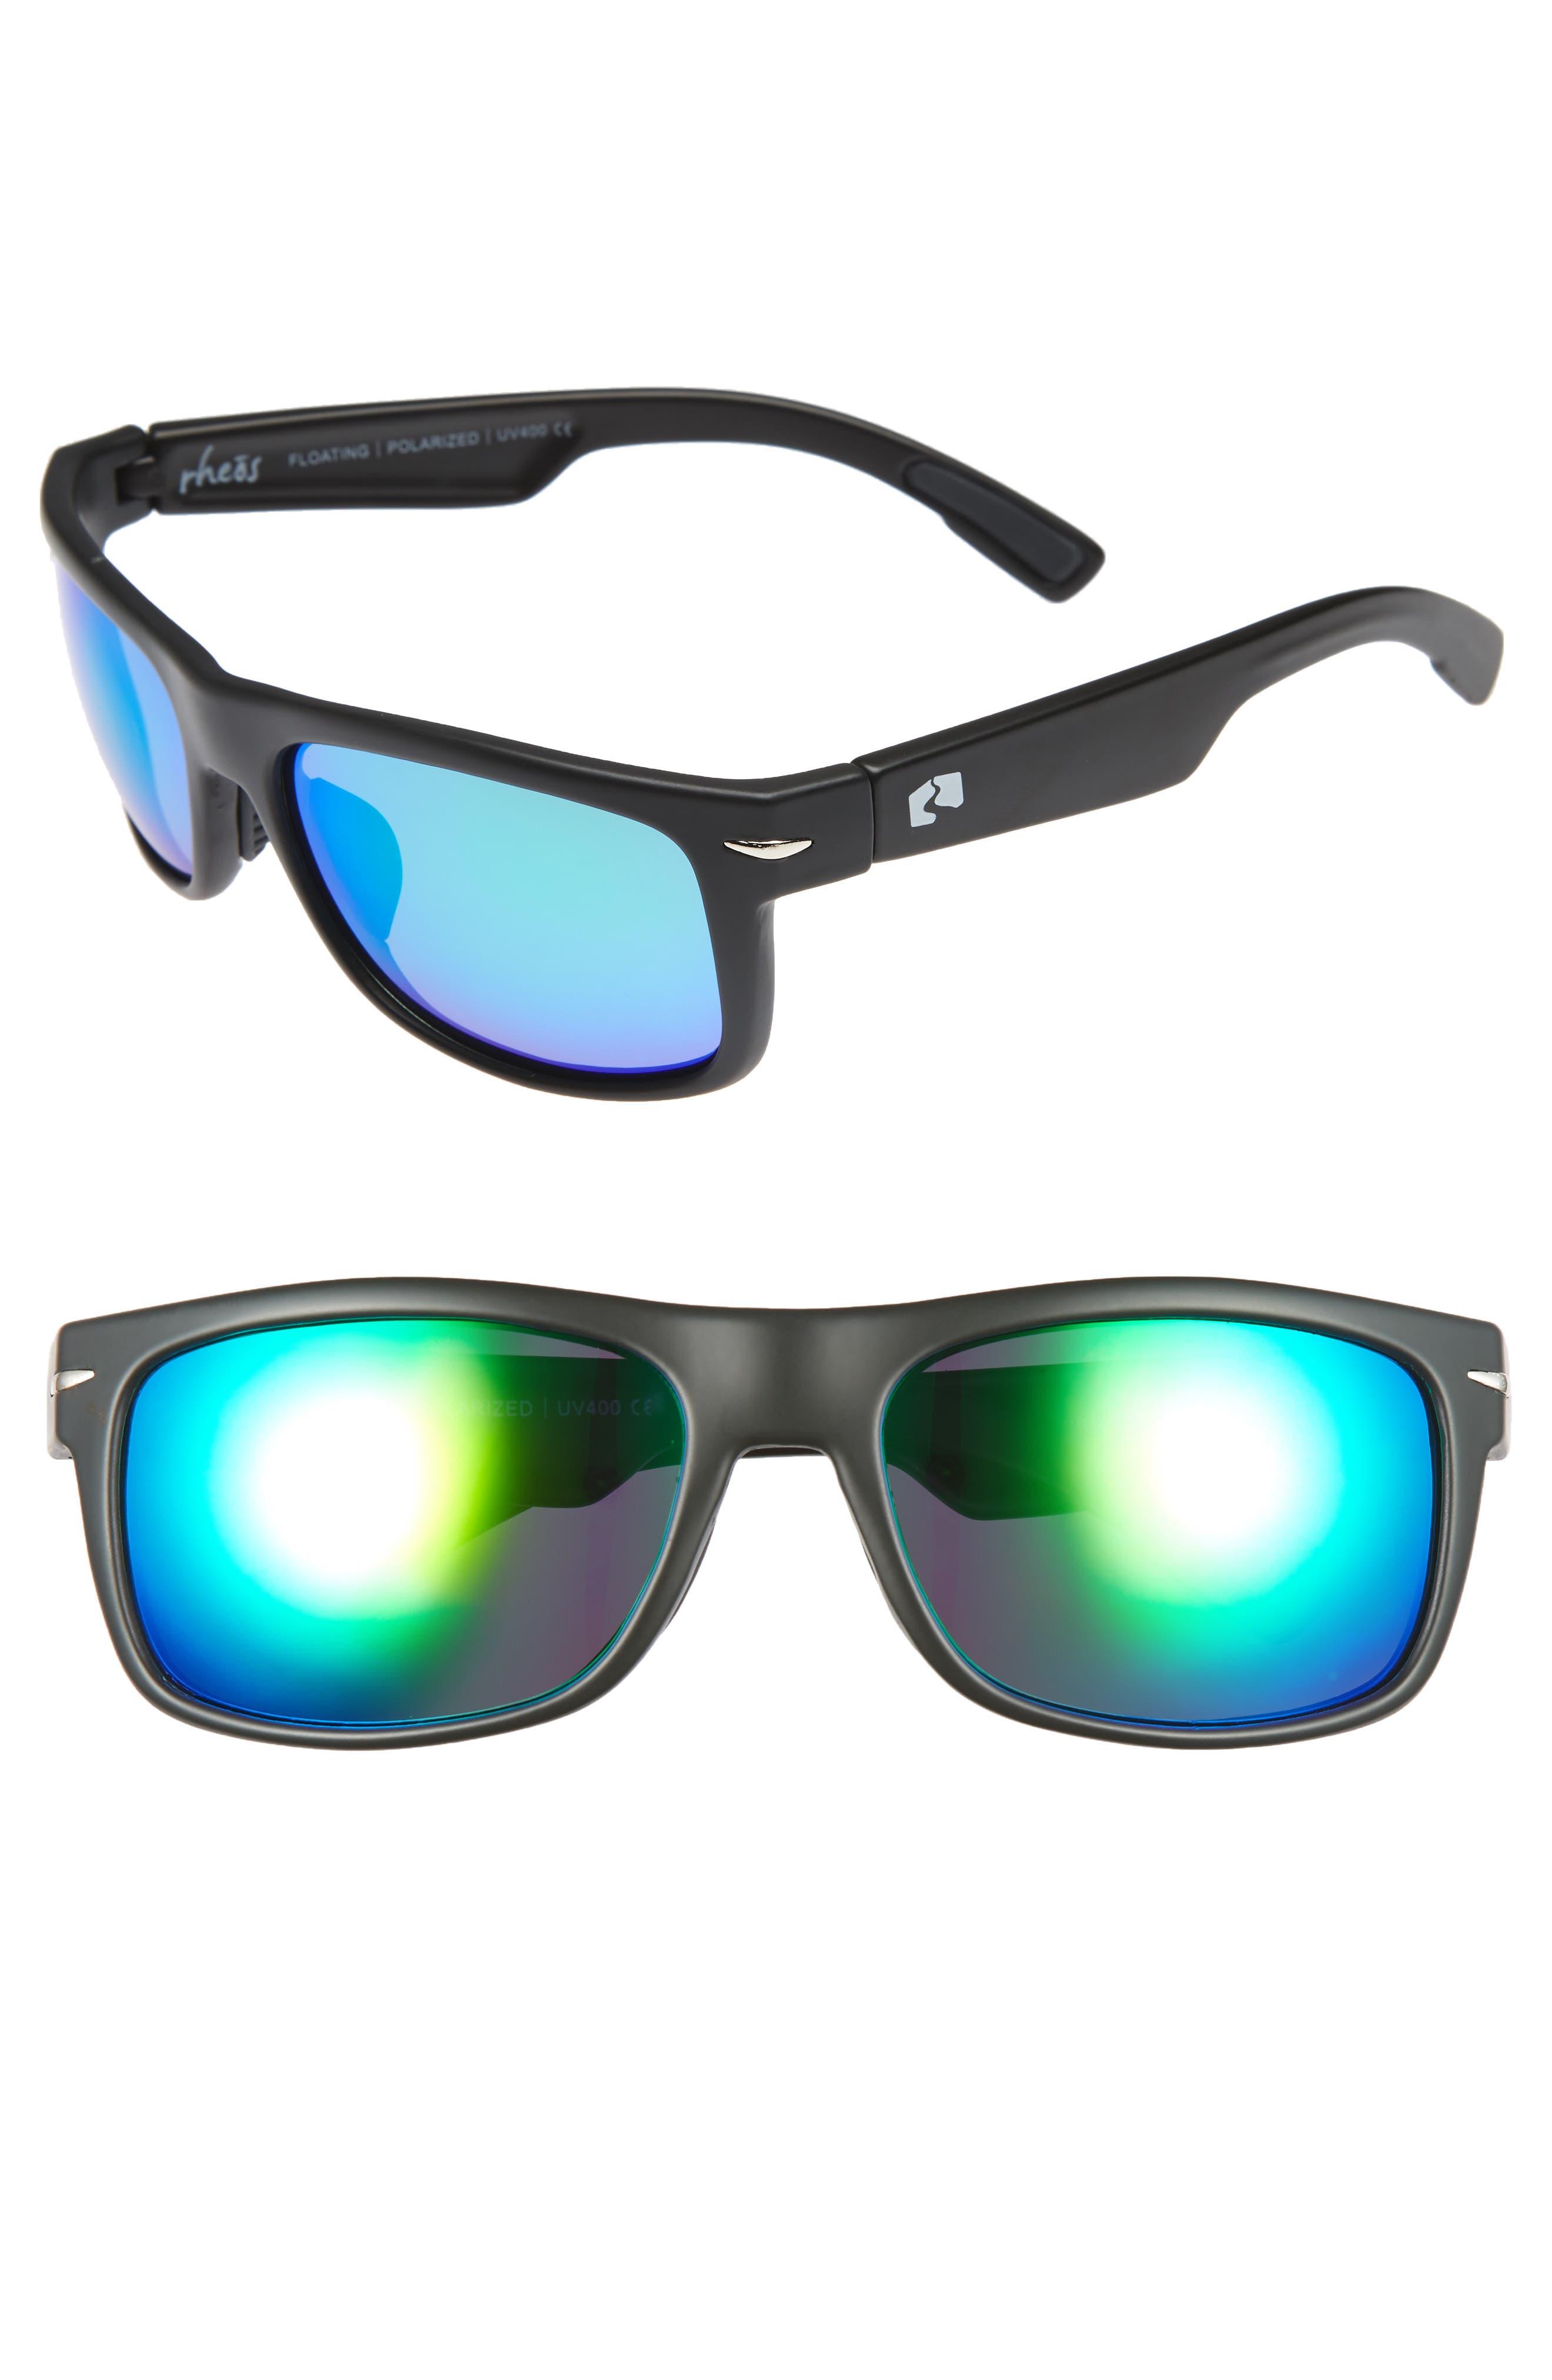 Alternate Image 1 Selected - Rheos Anhingas Floating 59mm Polarized Sunglasses